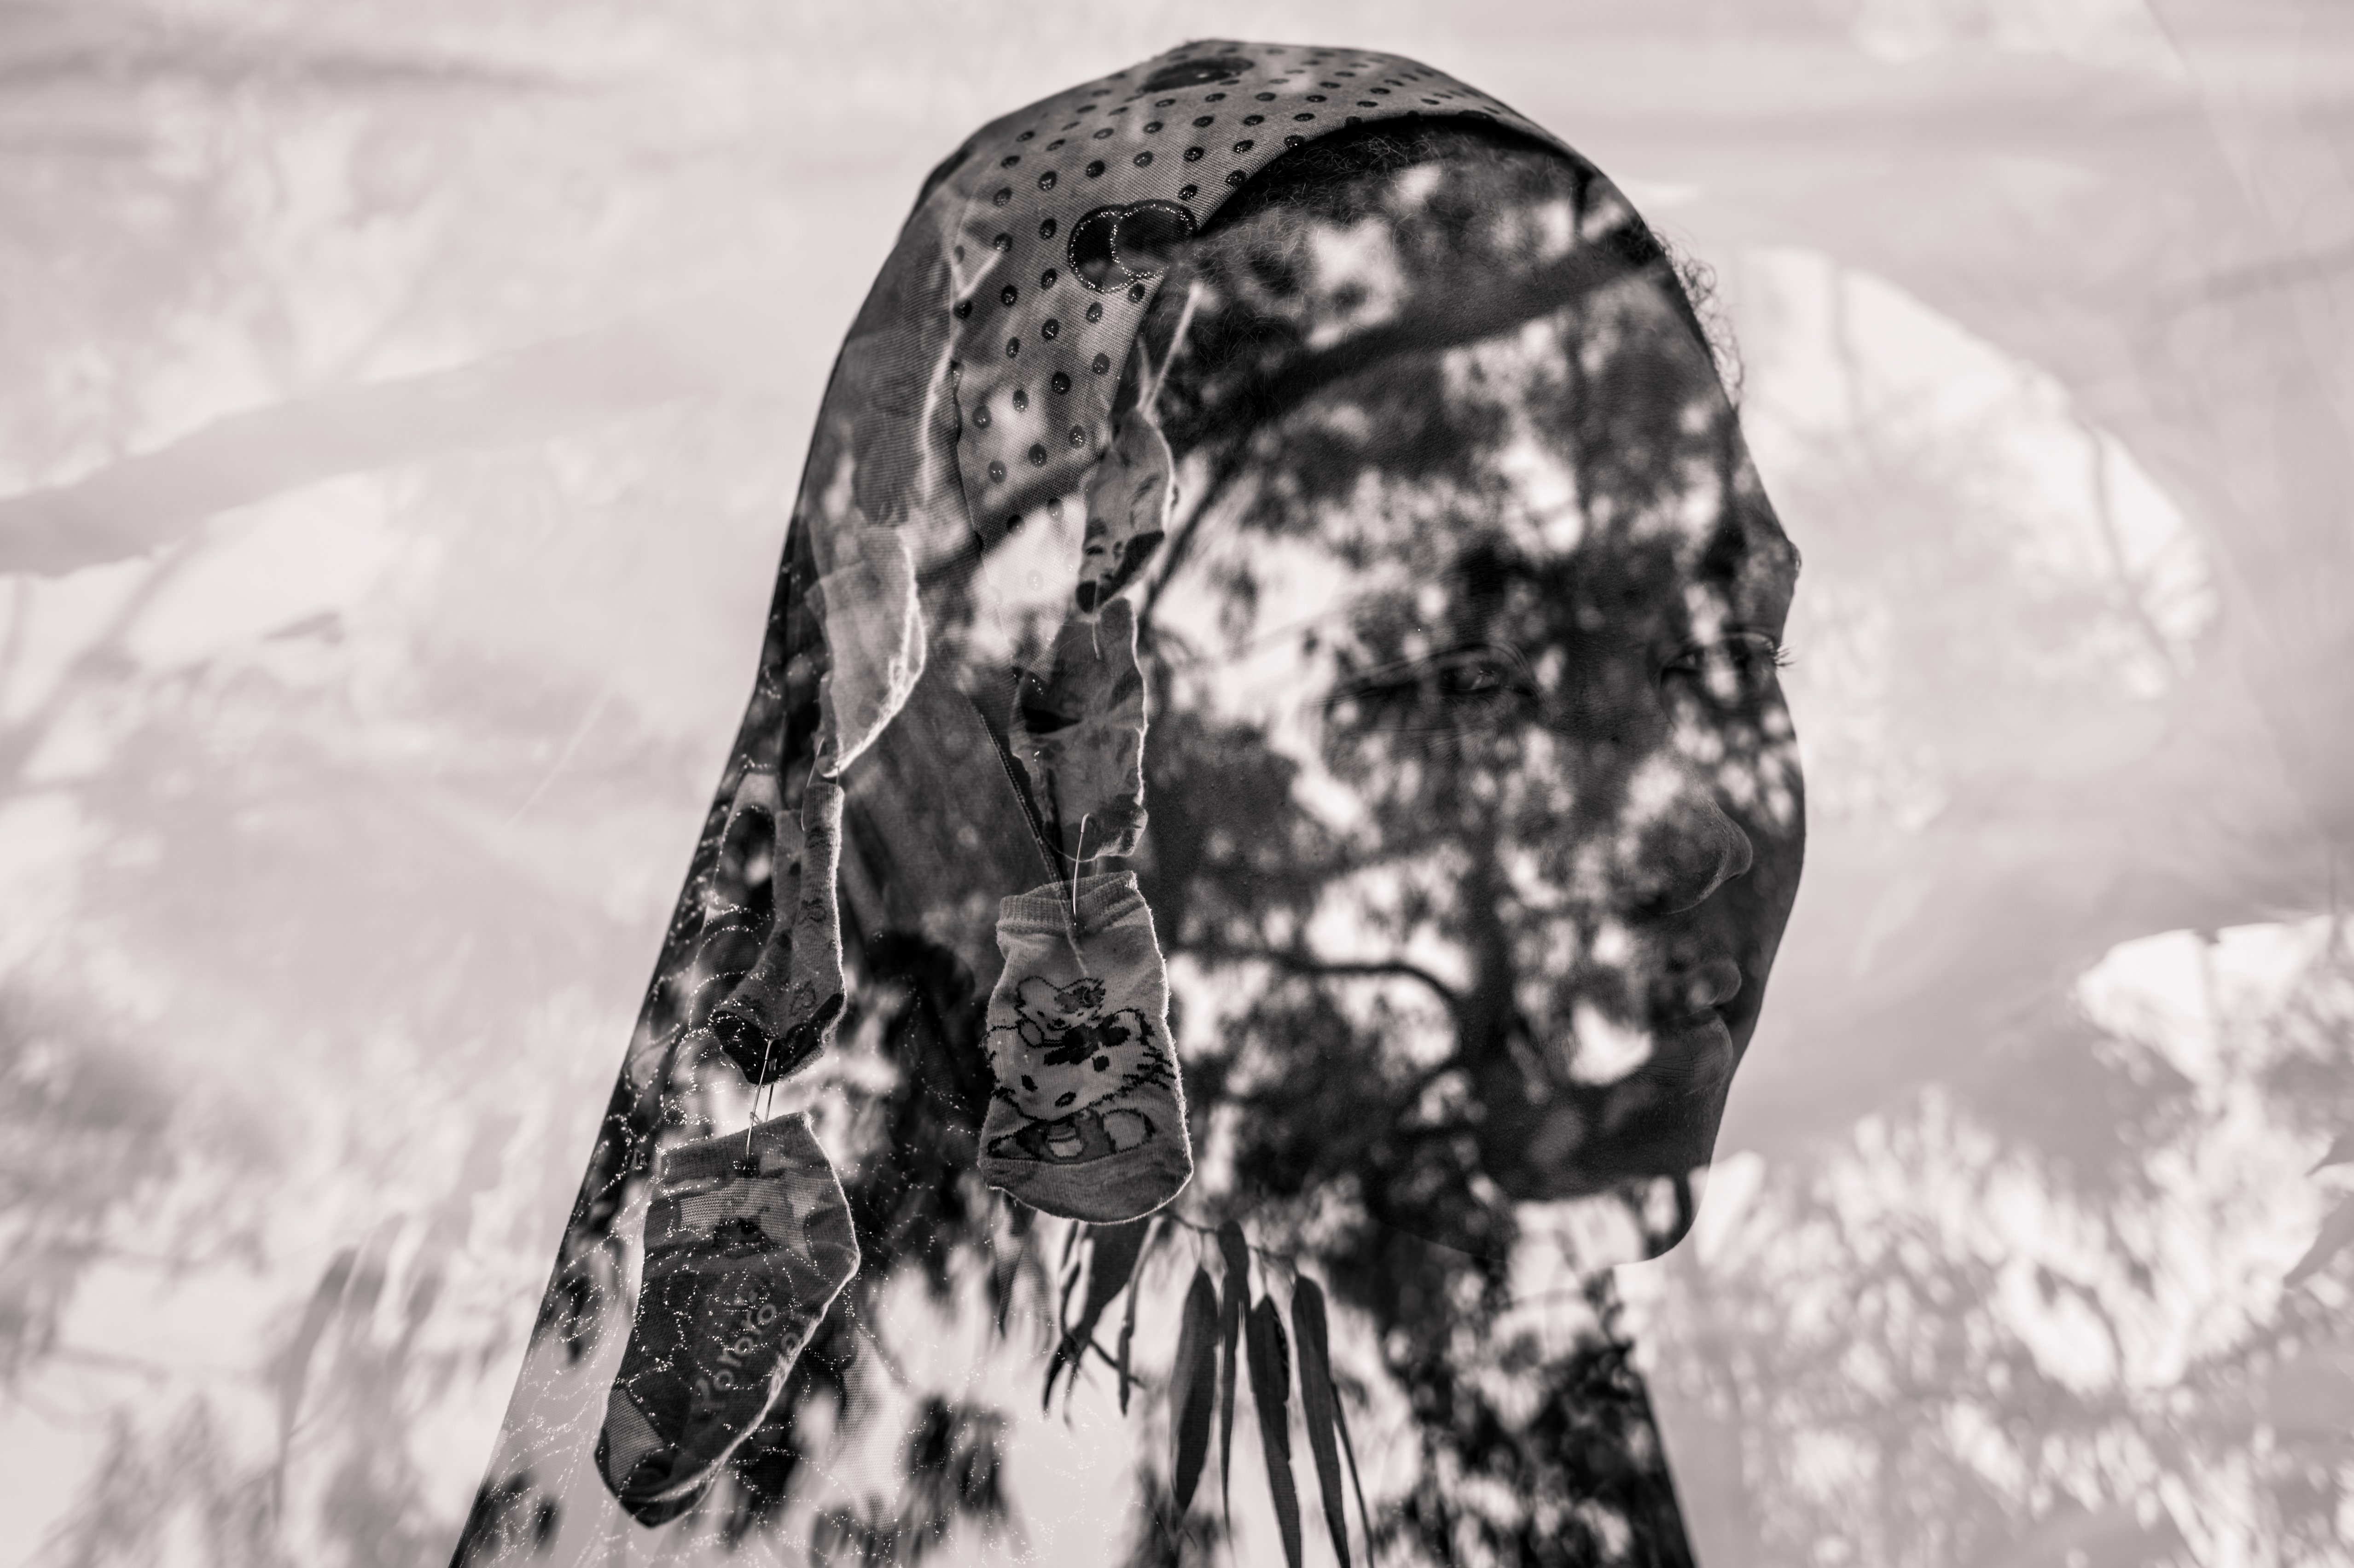 etinosa-yvonne-unfpa-profile-nigeria-1